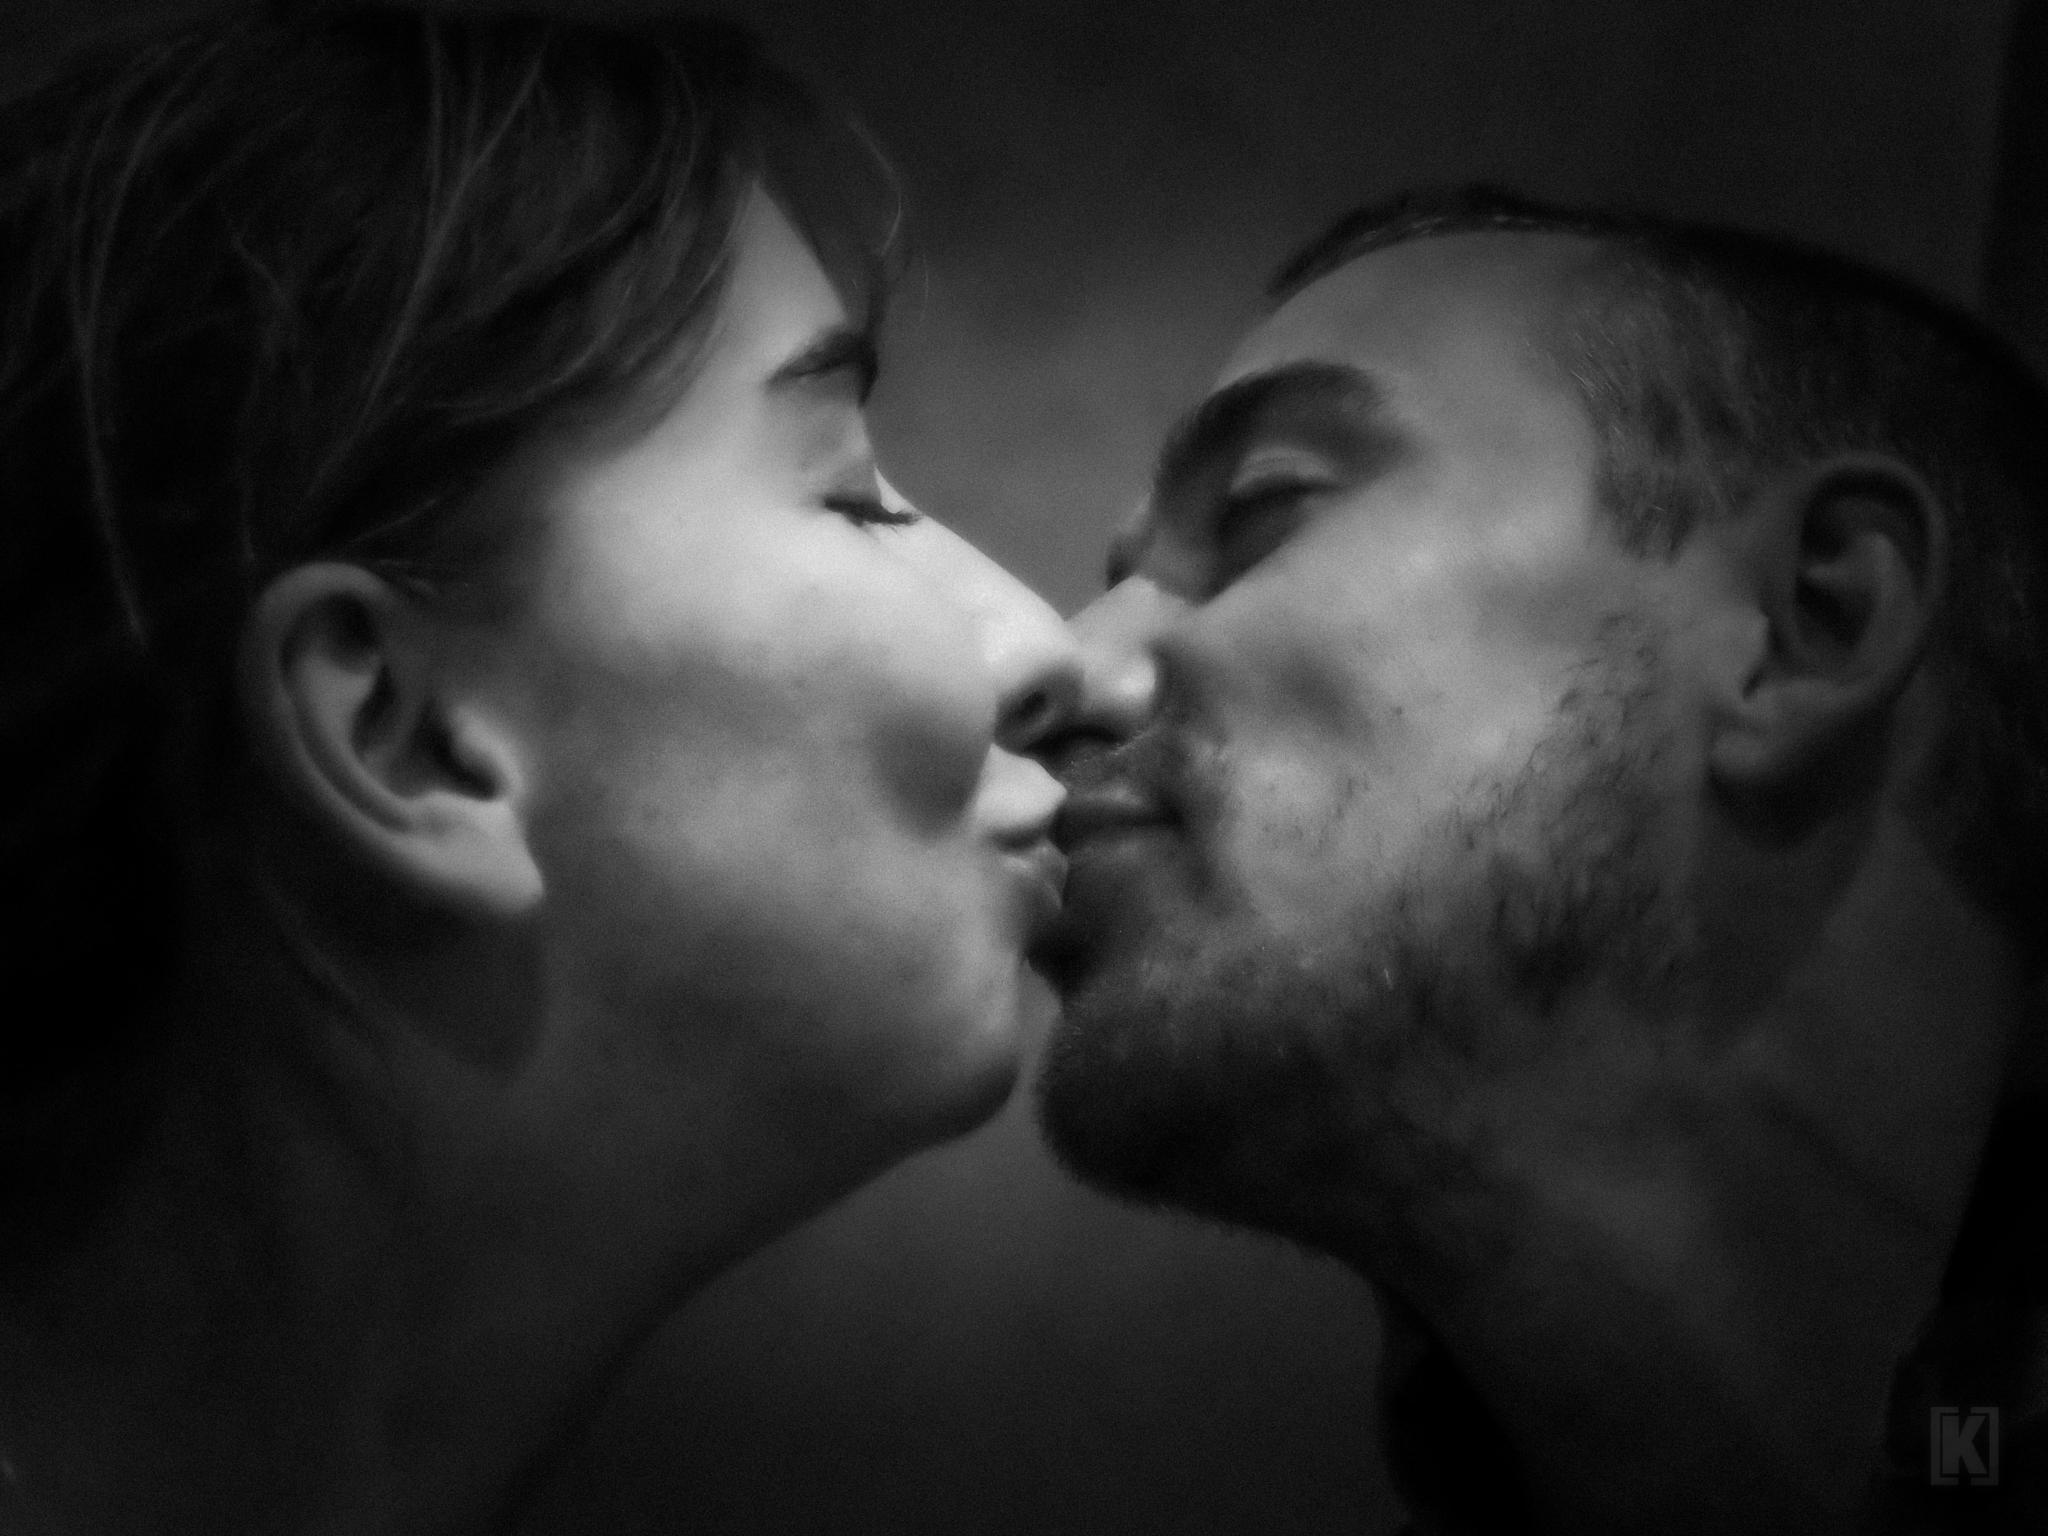 Le  baiser....... by kriska62 photographe